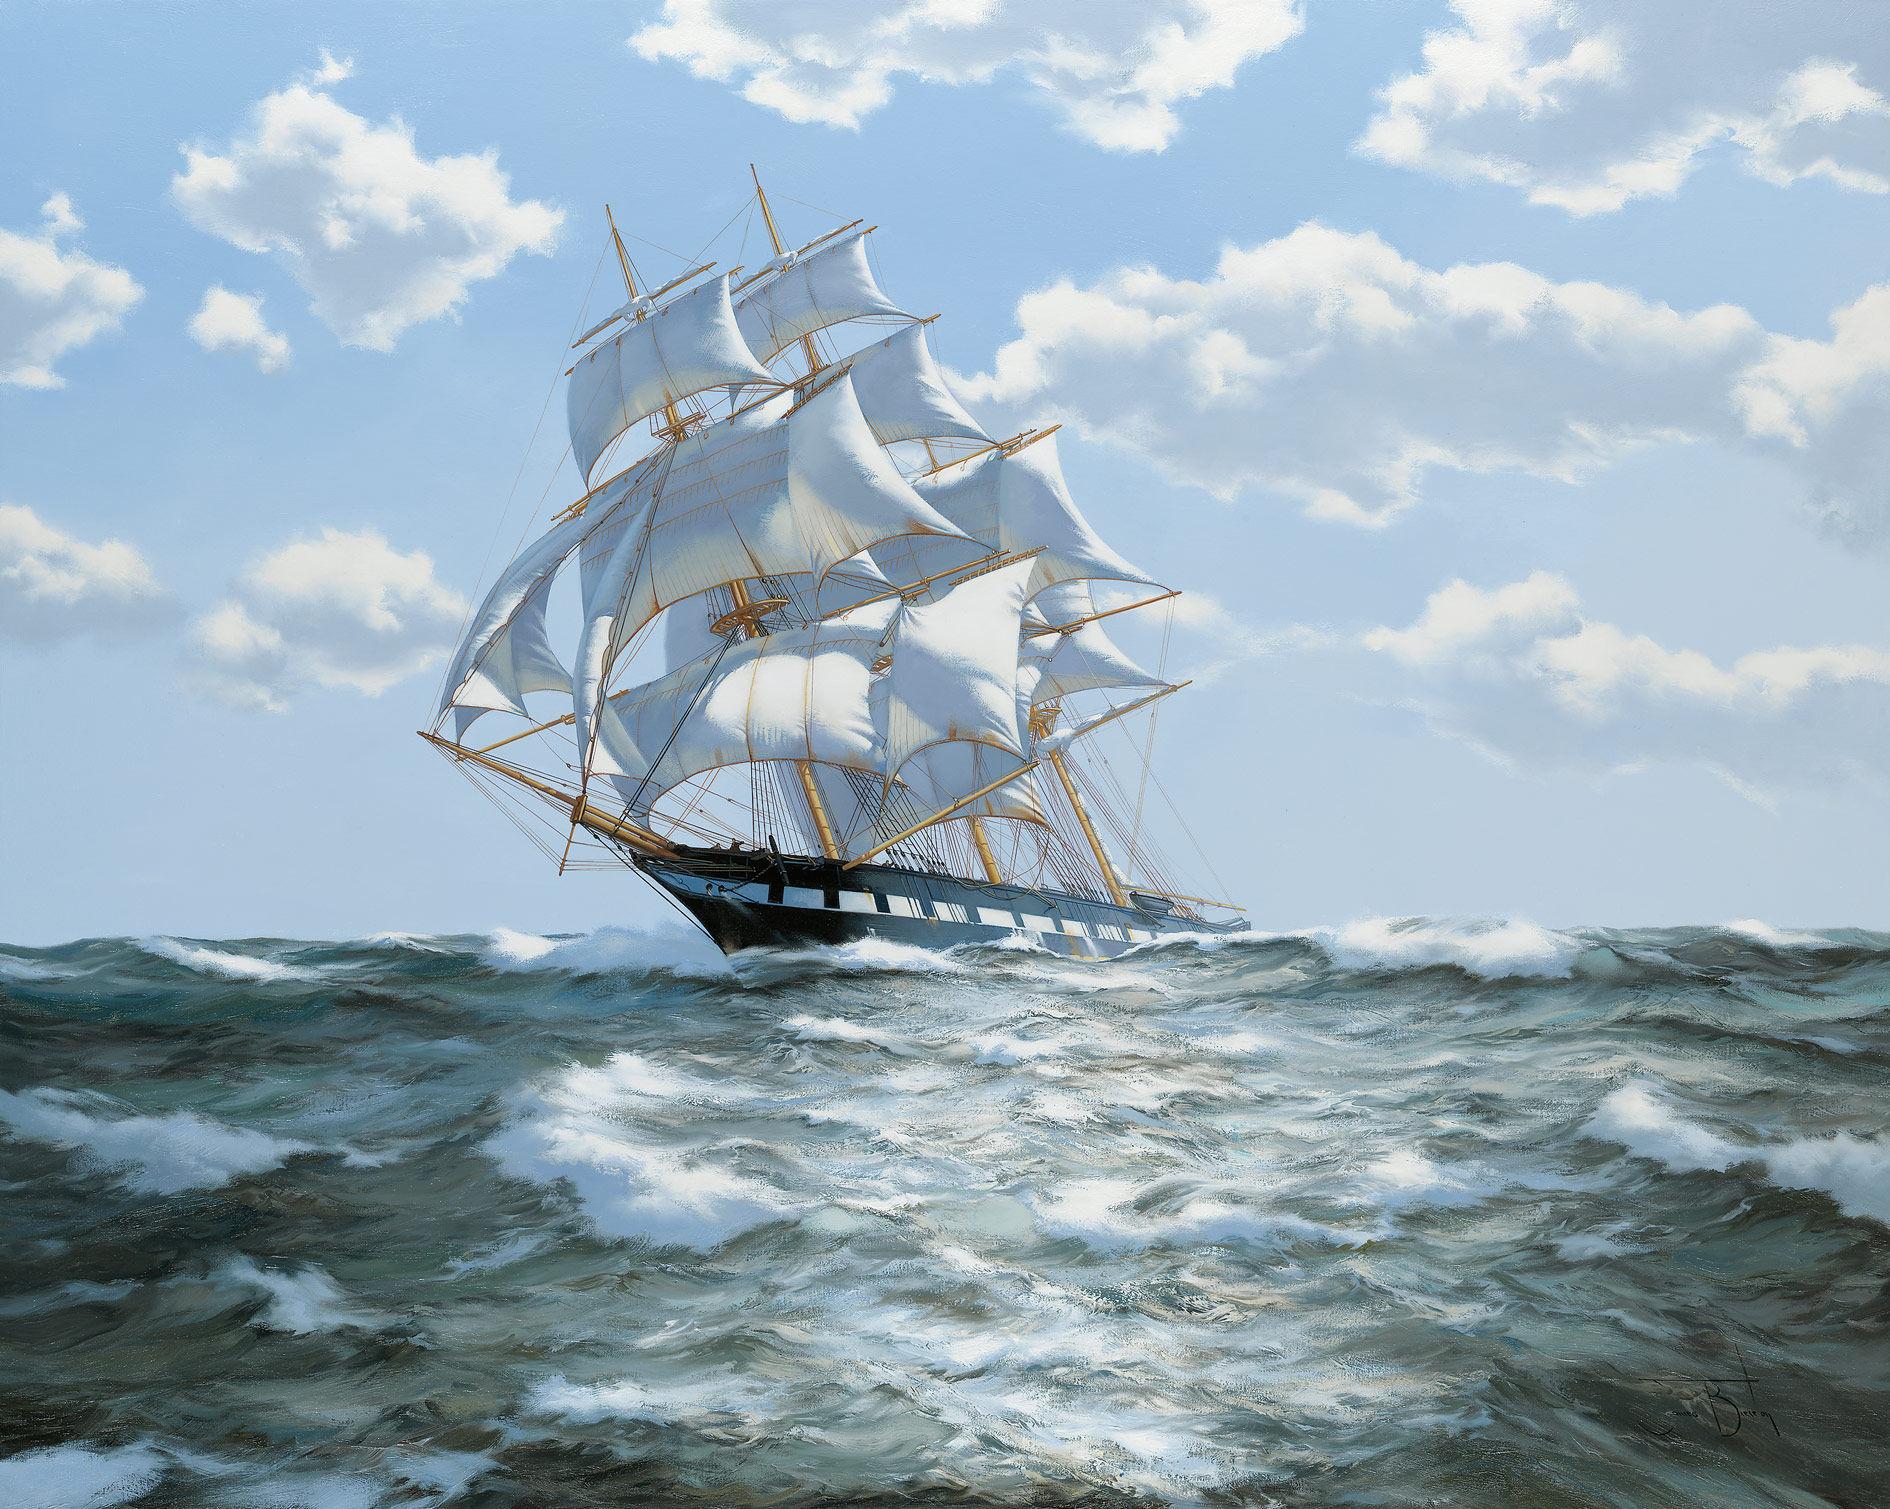 картинки с морскими кораблями перед